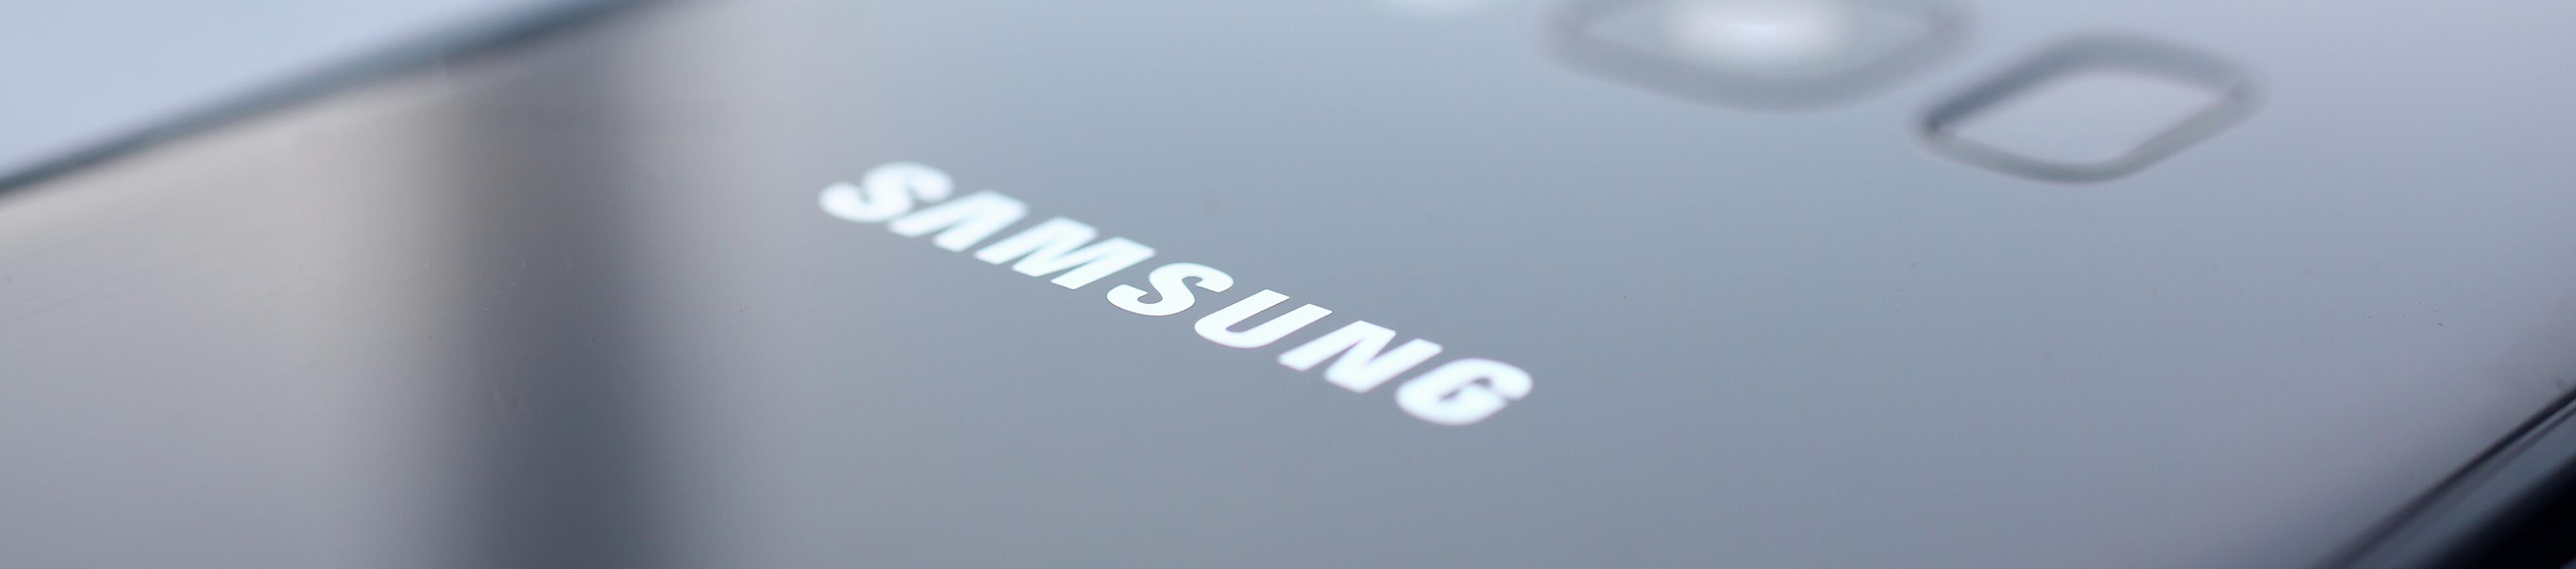 Black Friday Samsung Galaxy s9